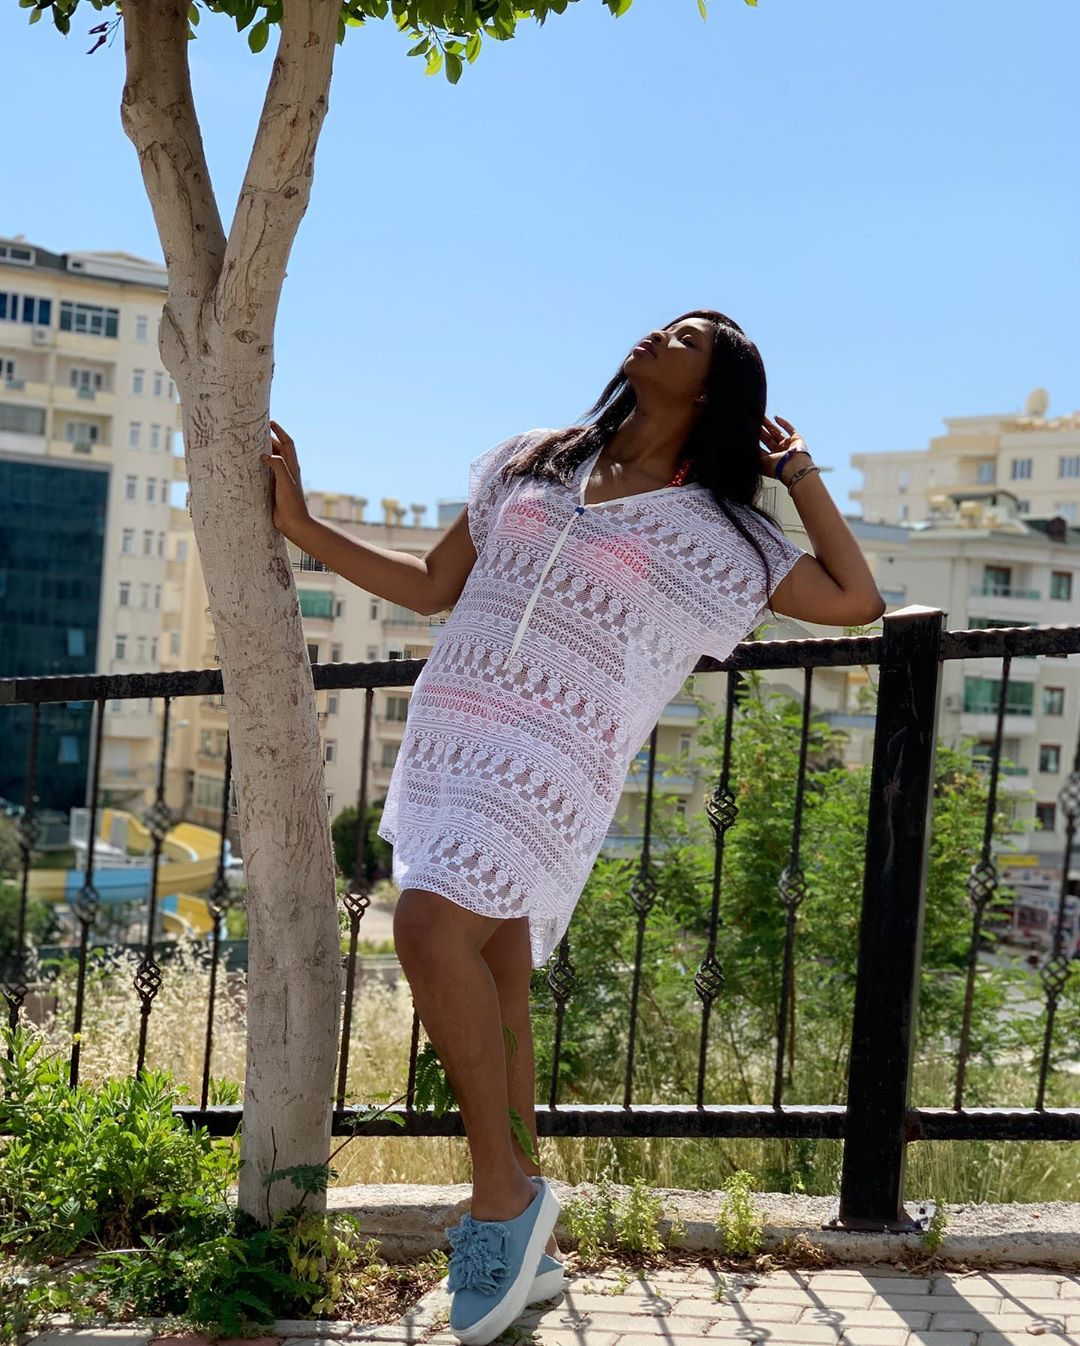 Controversial Actress, Etinosa Flaunts Bikini Clad Body On